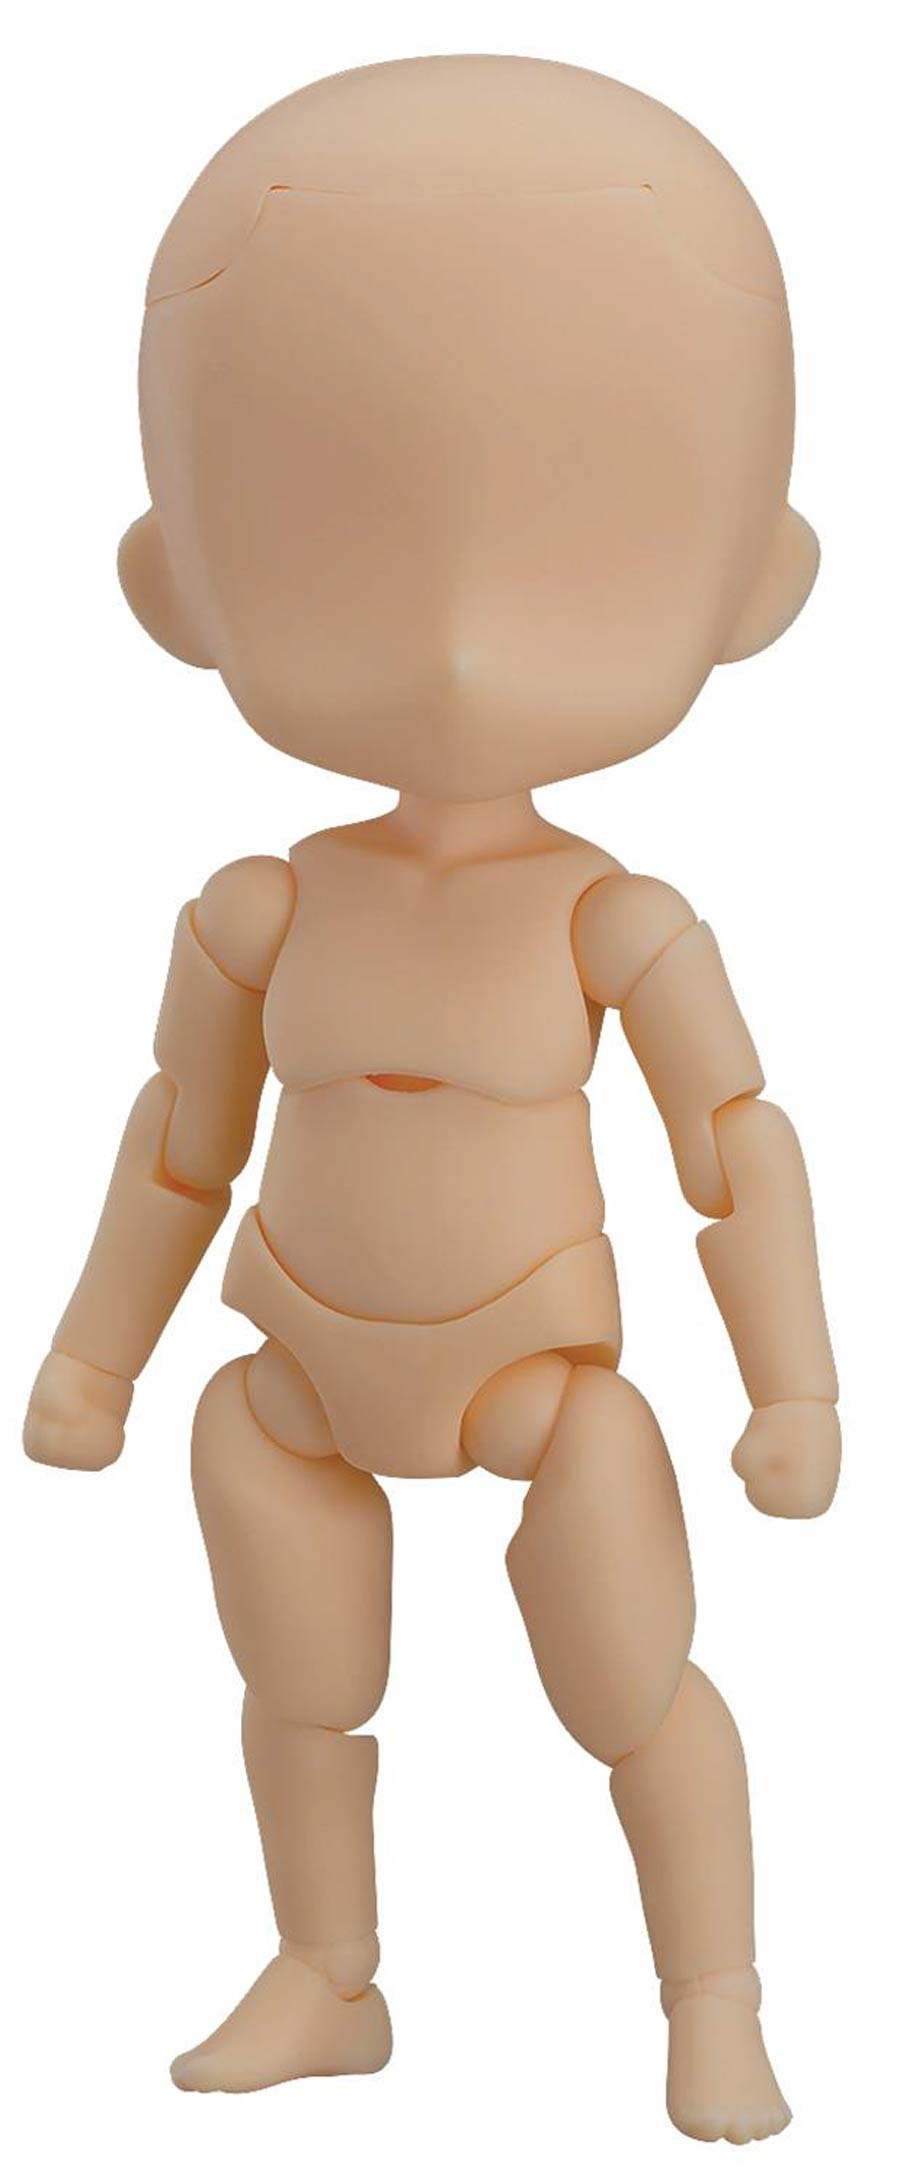 Nendoroid Doll Boy Archetype Action Figure - Almond Milk Color